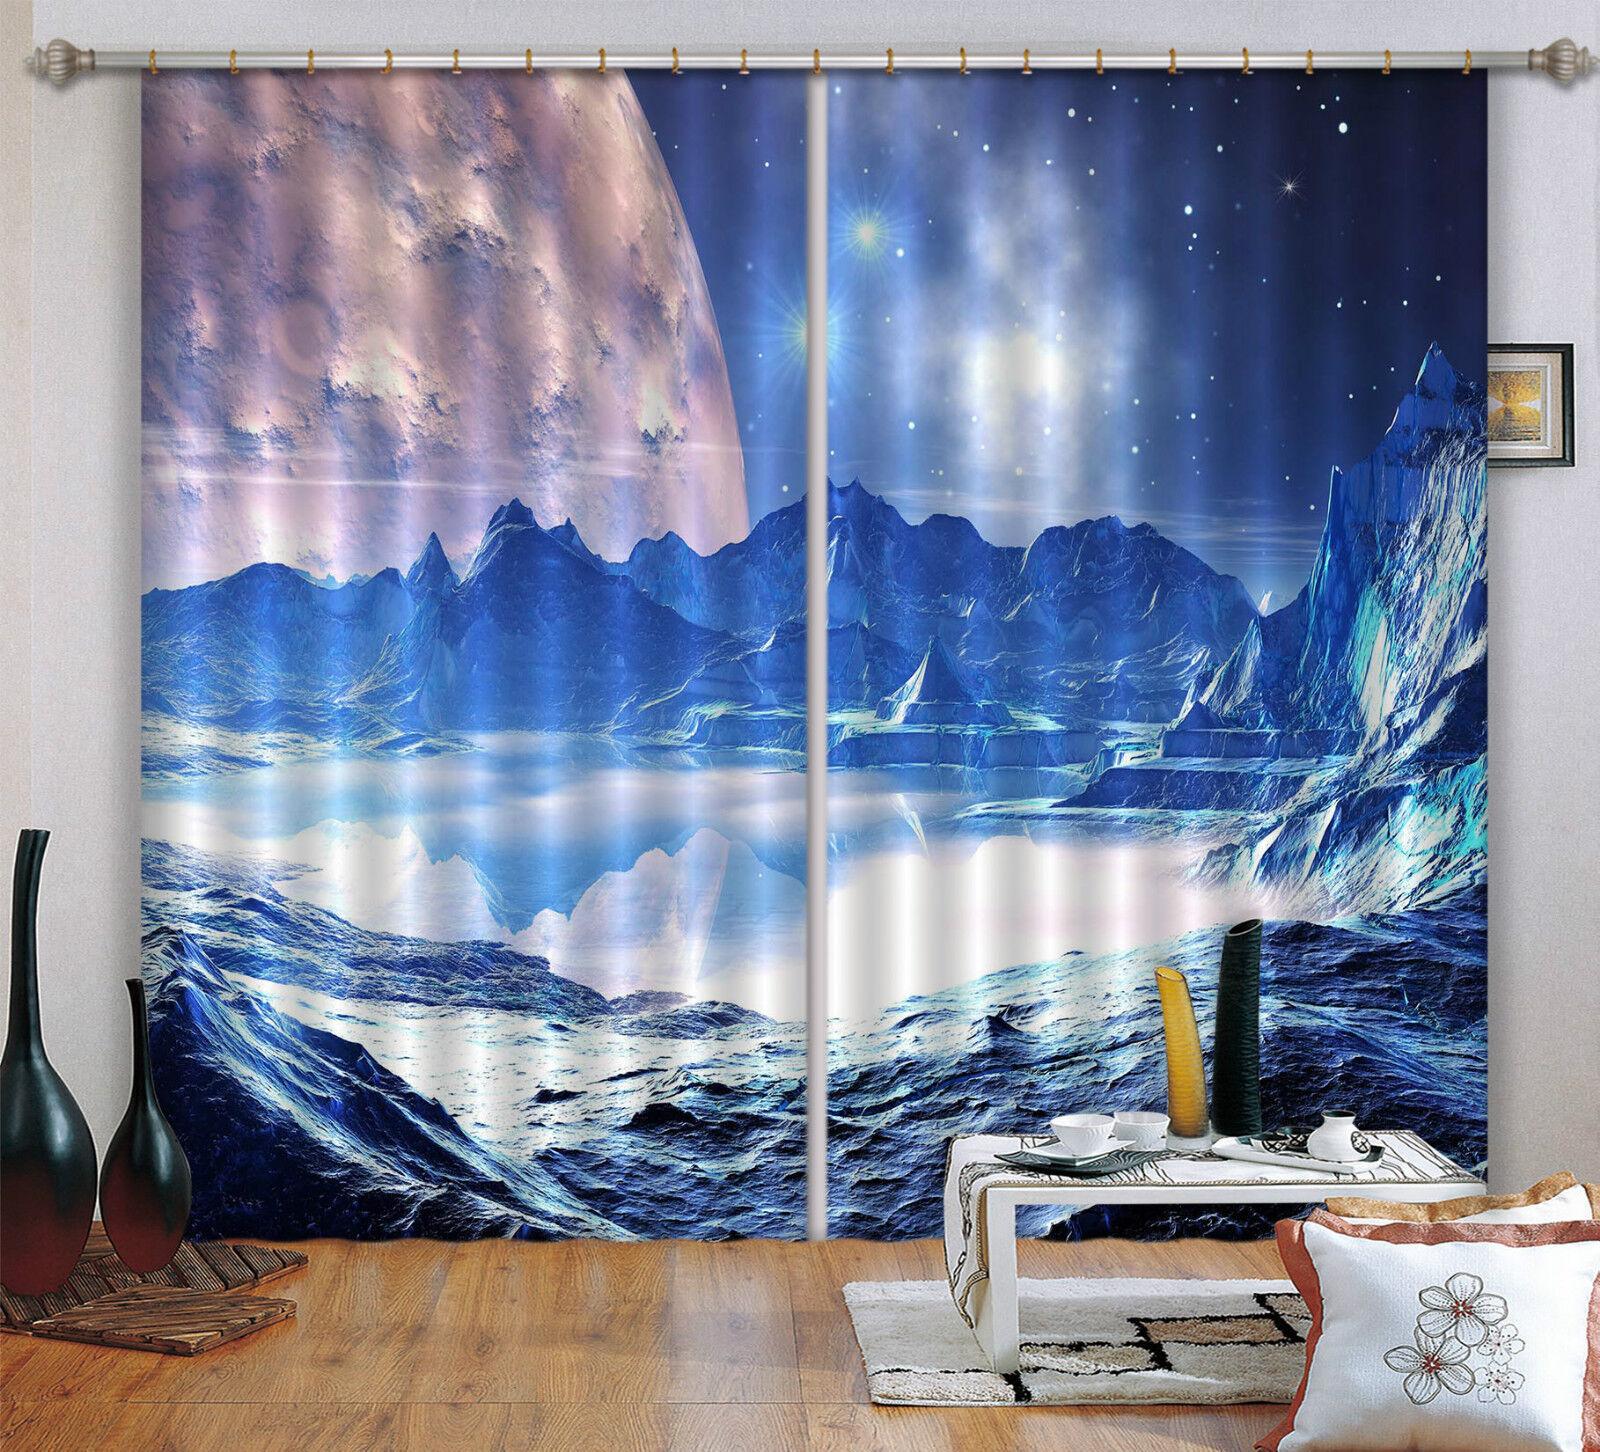 3d Planet vista 61 bloqueo foto cortina cortina de impresión sustancia cortinas de ventana